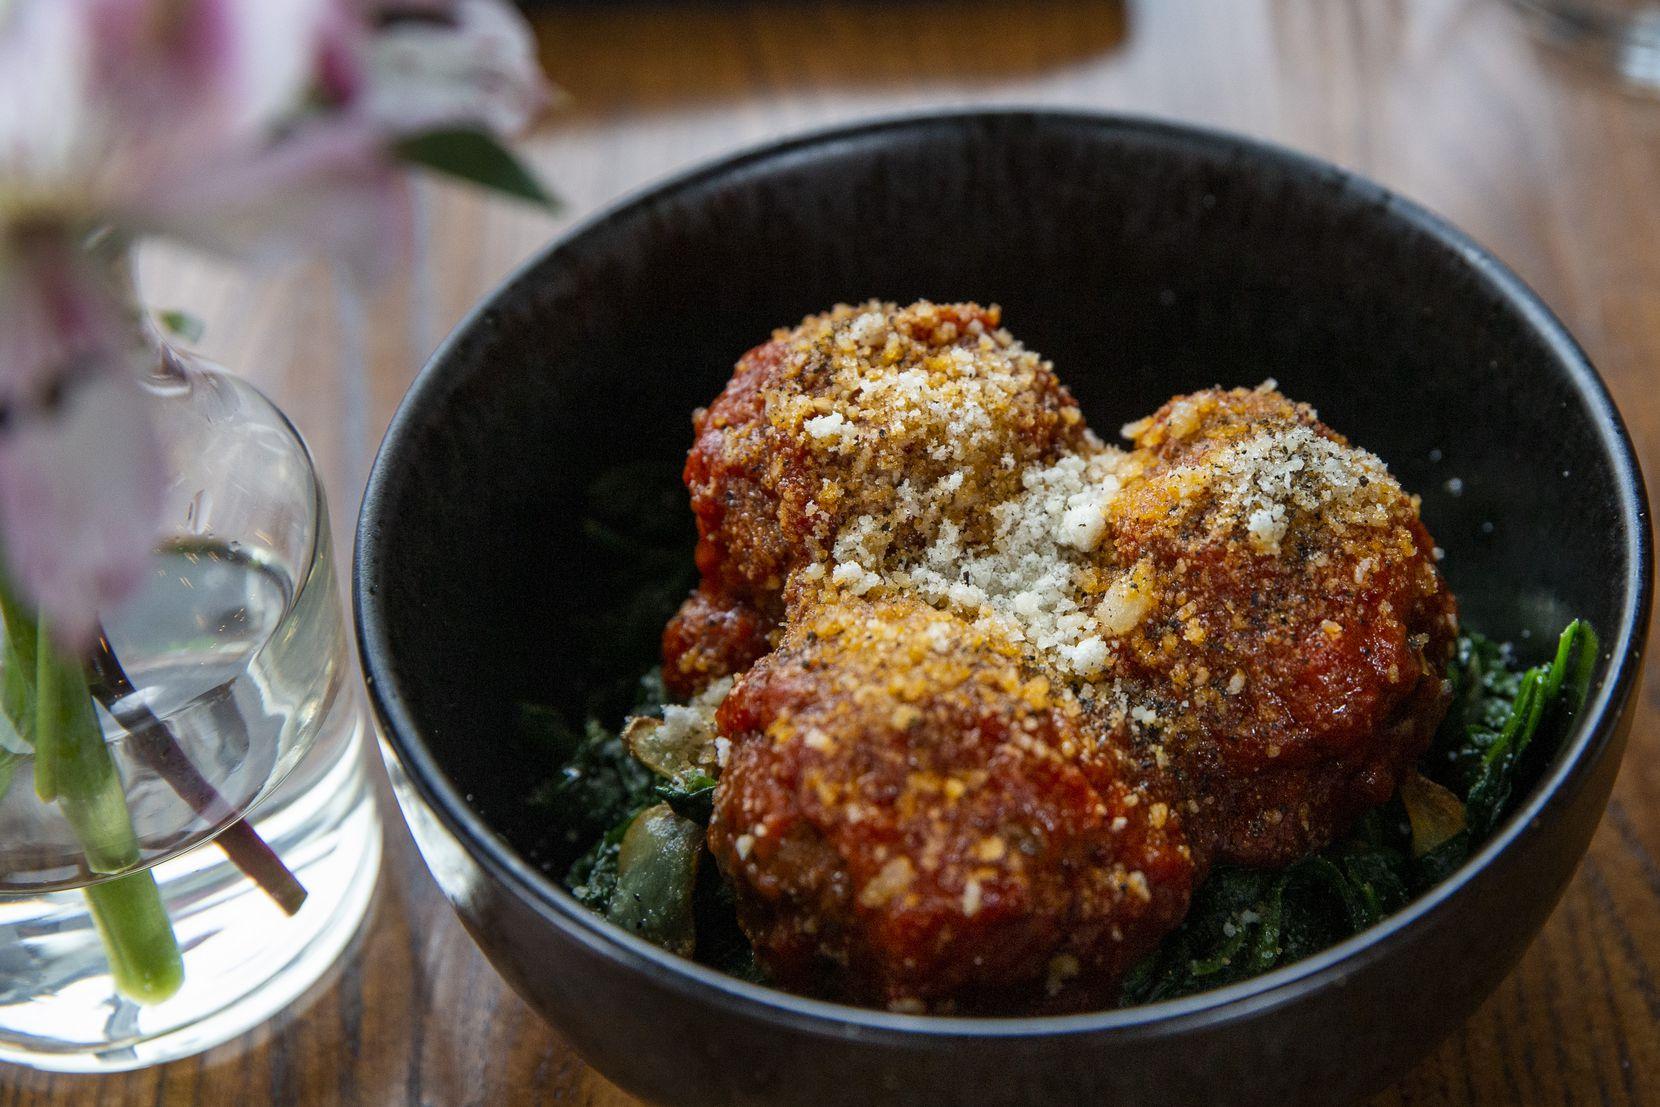 The lamb meatballs at Mille Lire restaurant